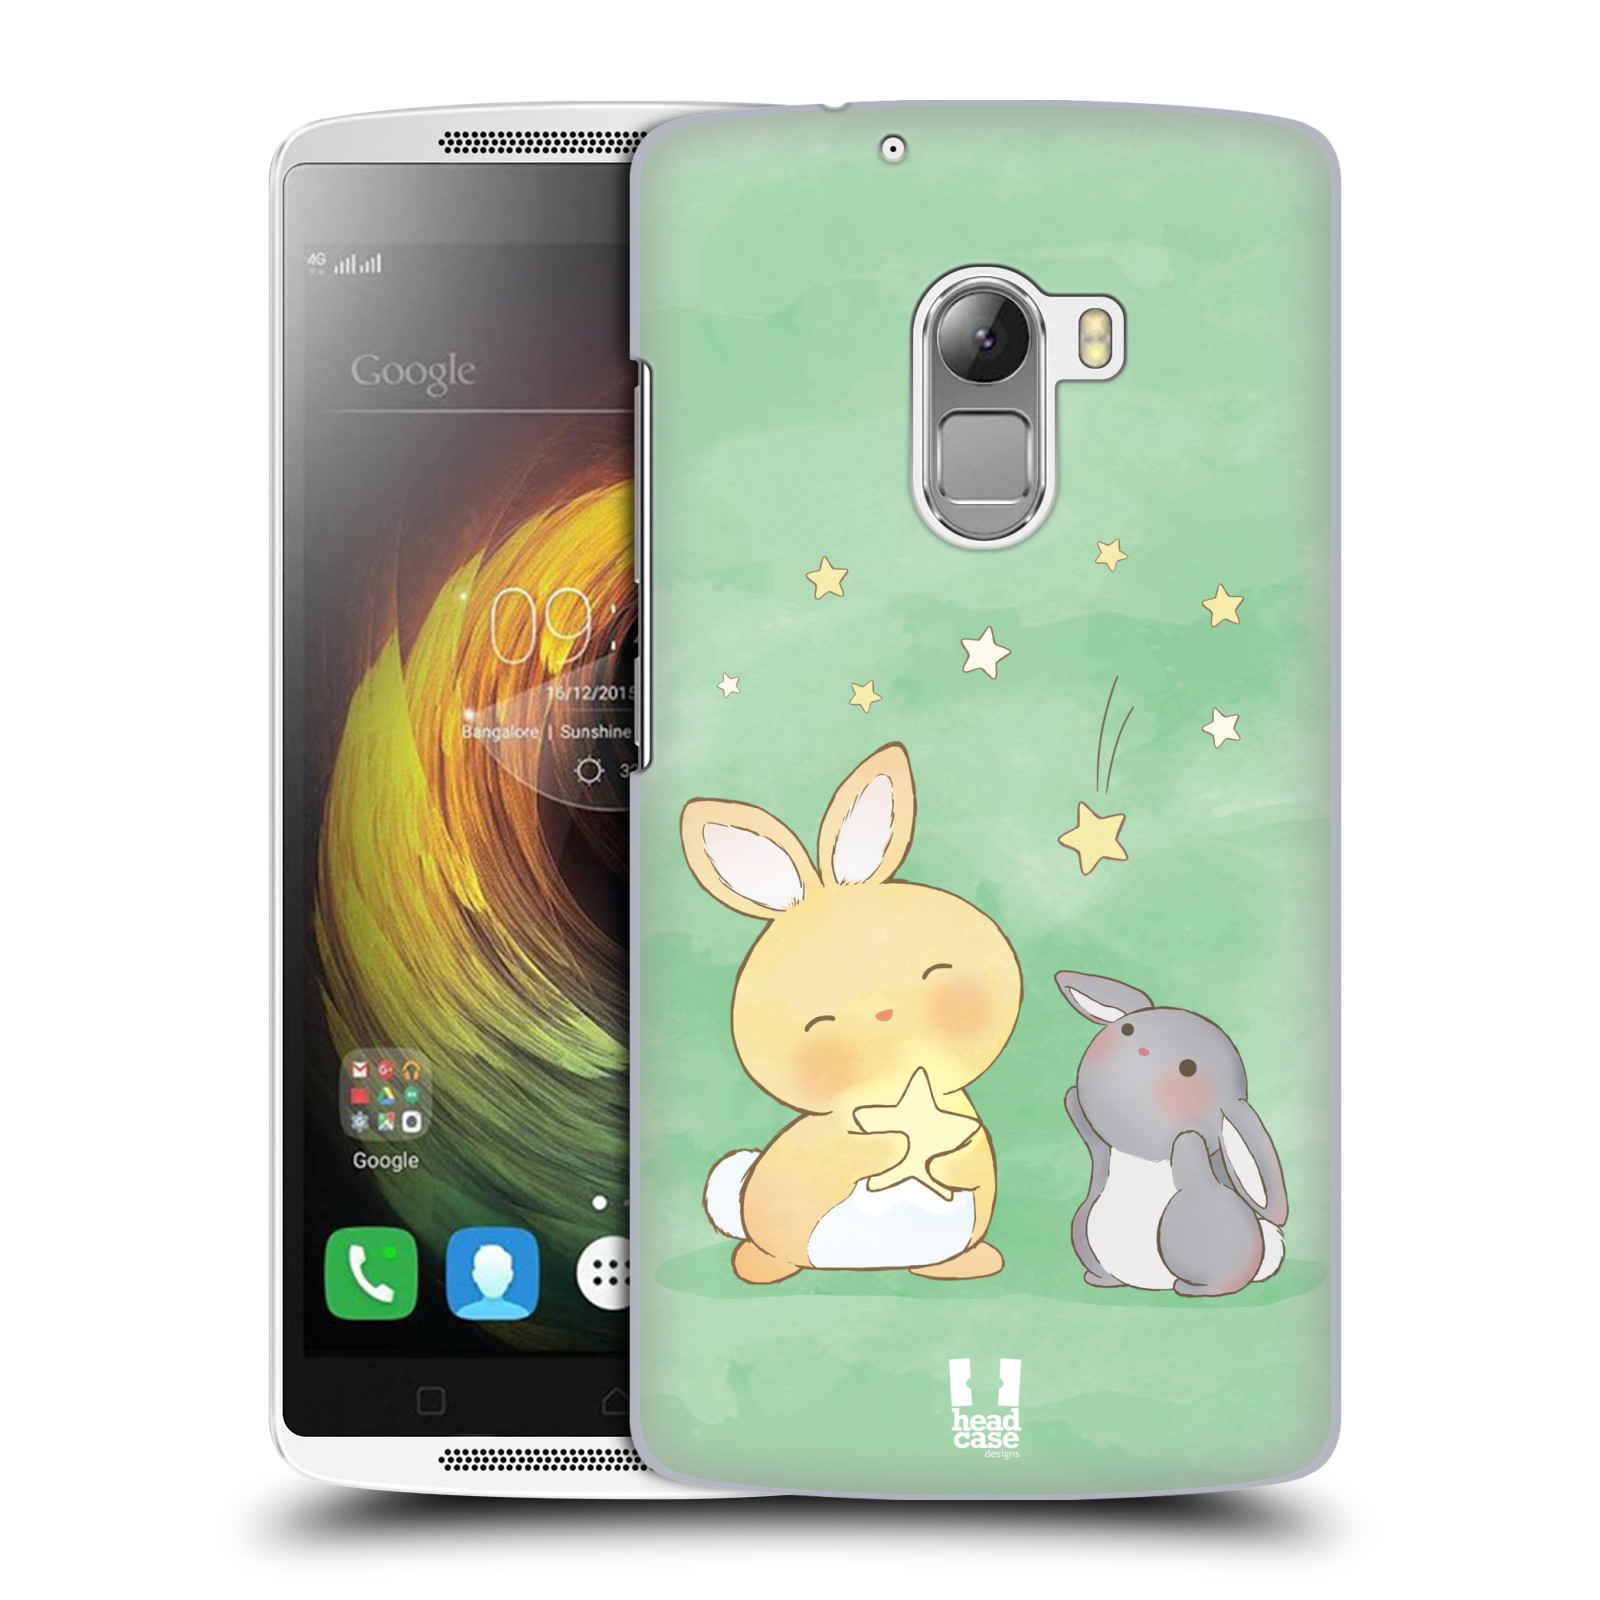 HEAD CASE pevný plastový obal na mobil LENOVO A7010 / A7010 DUAL / K4 Note / Vibe X3 lite vzor králíček a hvězdy zelená